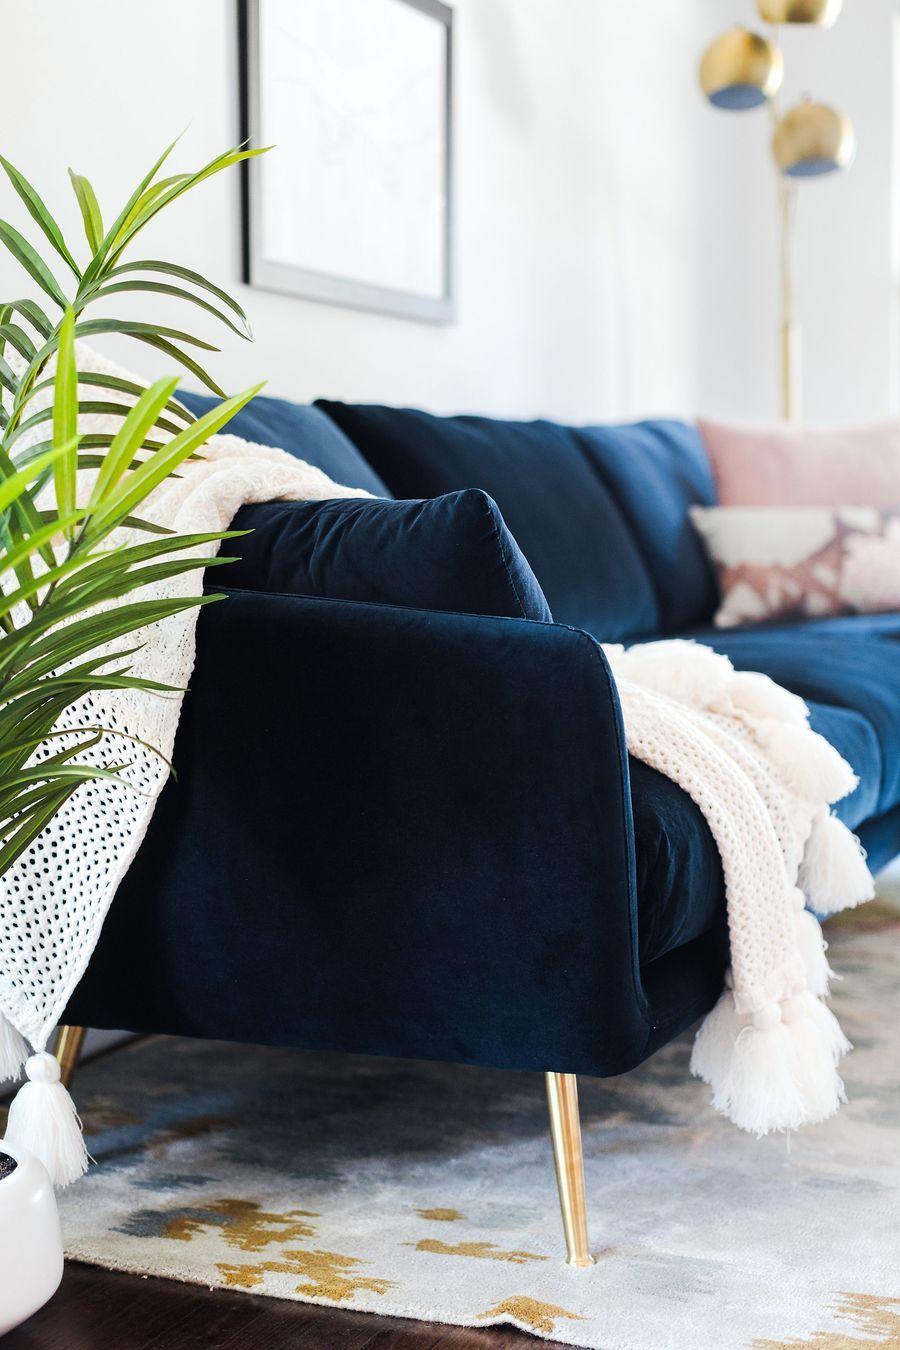 Harlow Sectional Sofa Blue Velvet Edloe Finch Furniture Co In 2020 Sectional Sofa Most Comfortable Couch Blue Velvet Sofa